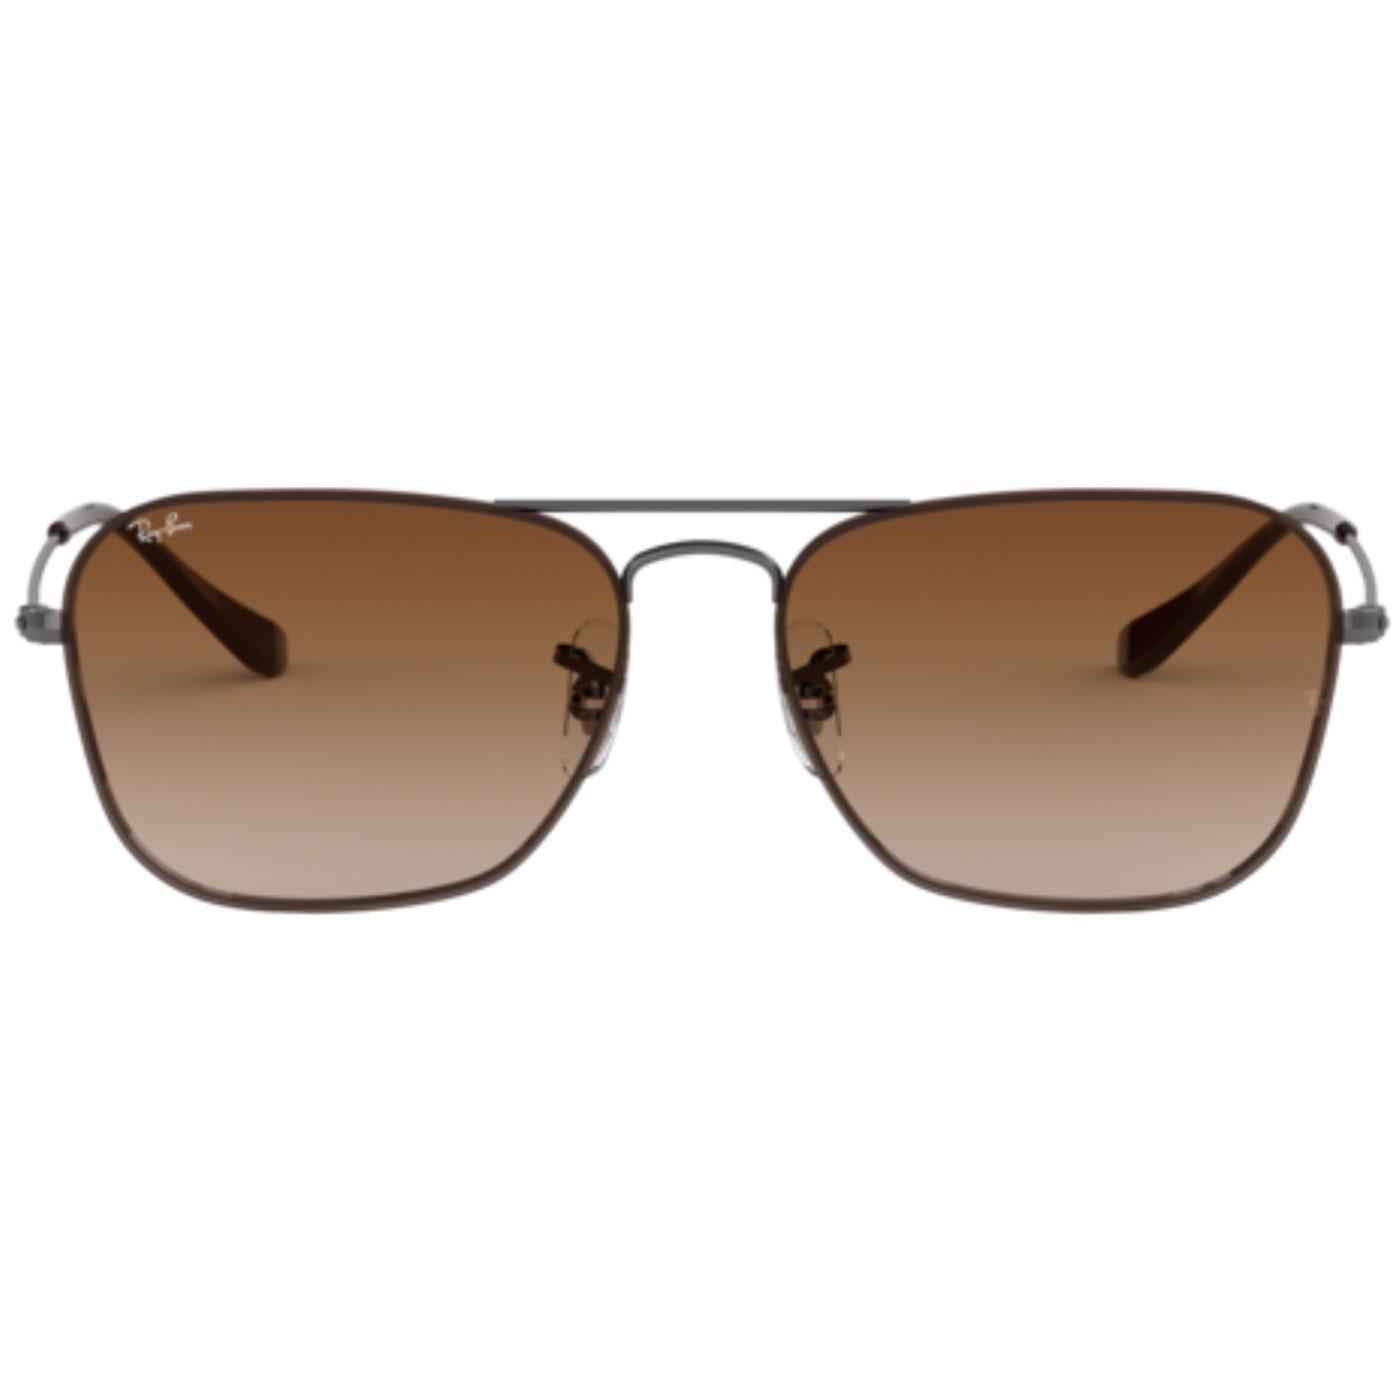 RAY-BAN Retro 70s Mod Small Caravan Sunglasses B